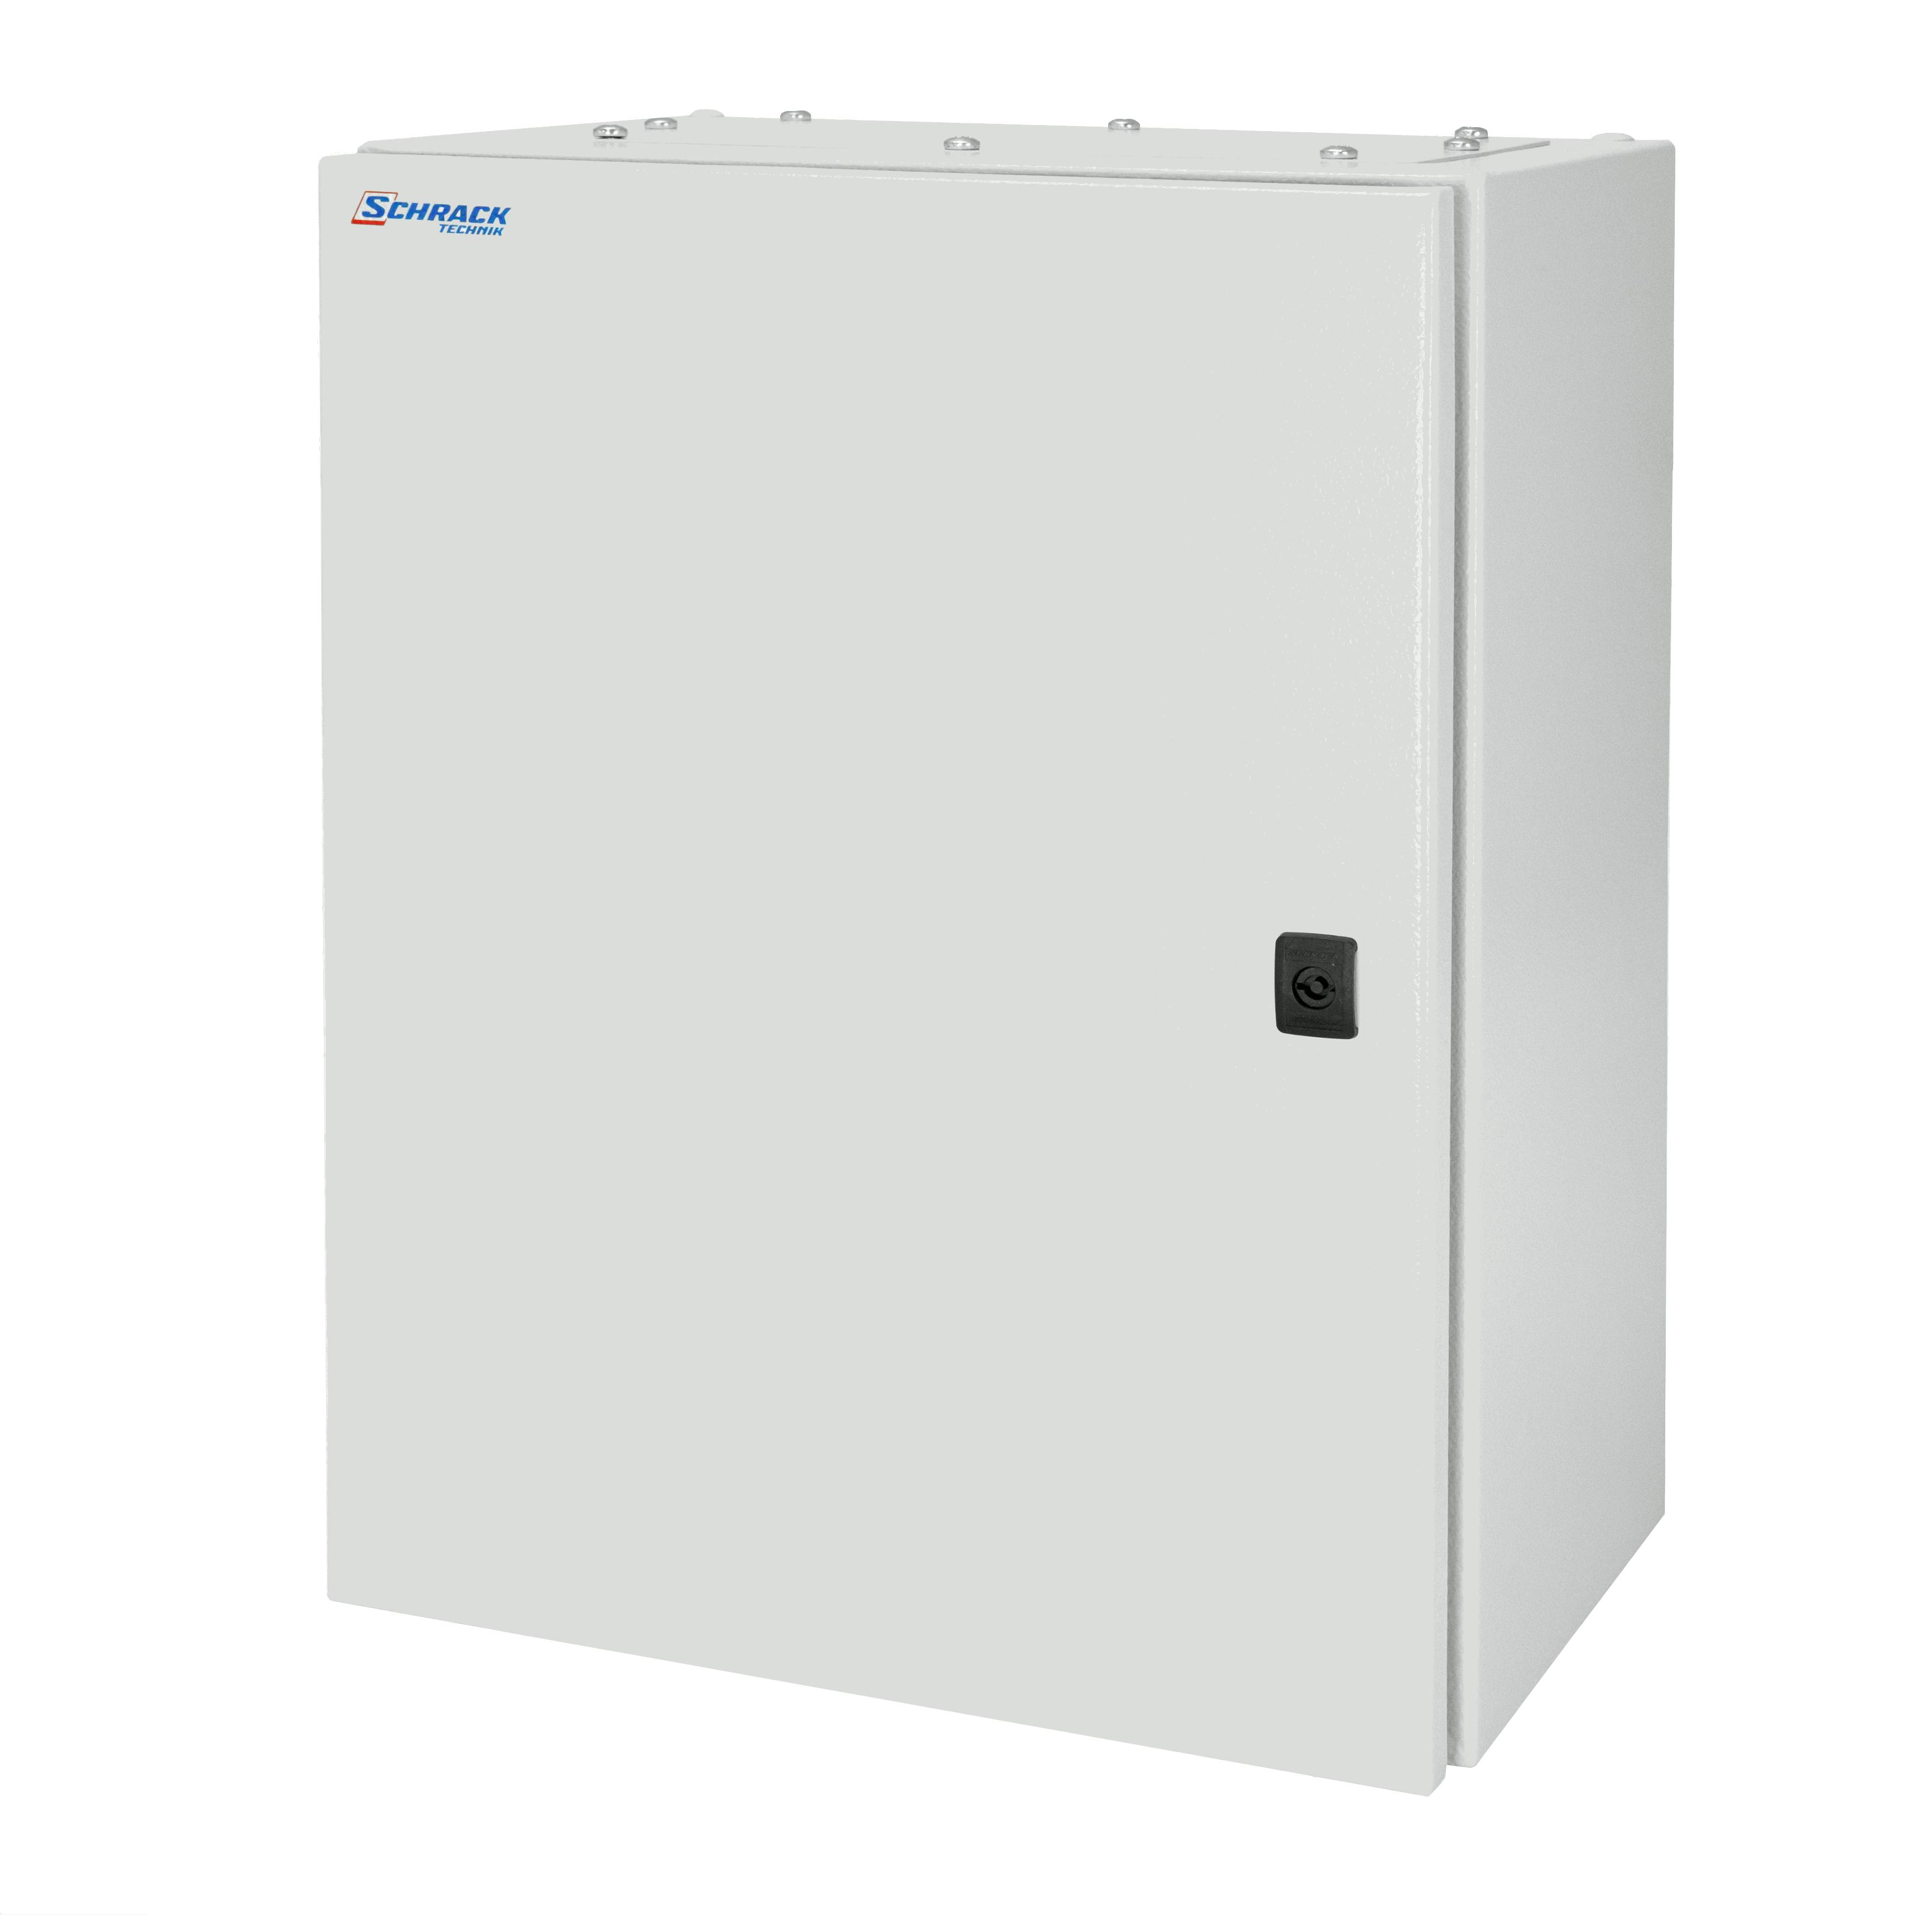 1 Stk Wandschrank Mono IP66 H=300 B=250 T=155 Stahlblech WSM3025150